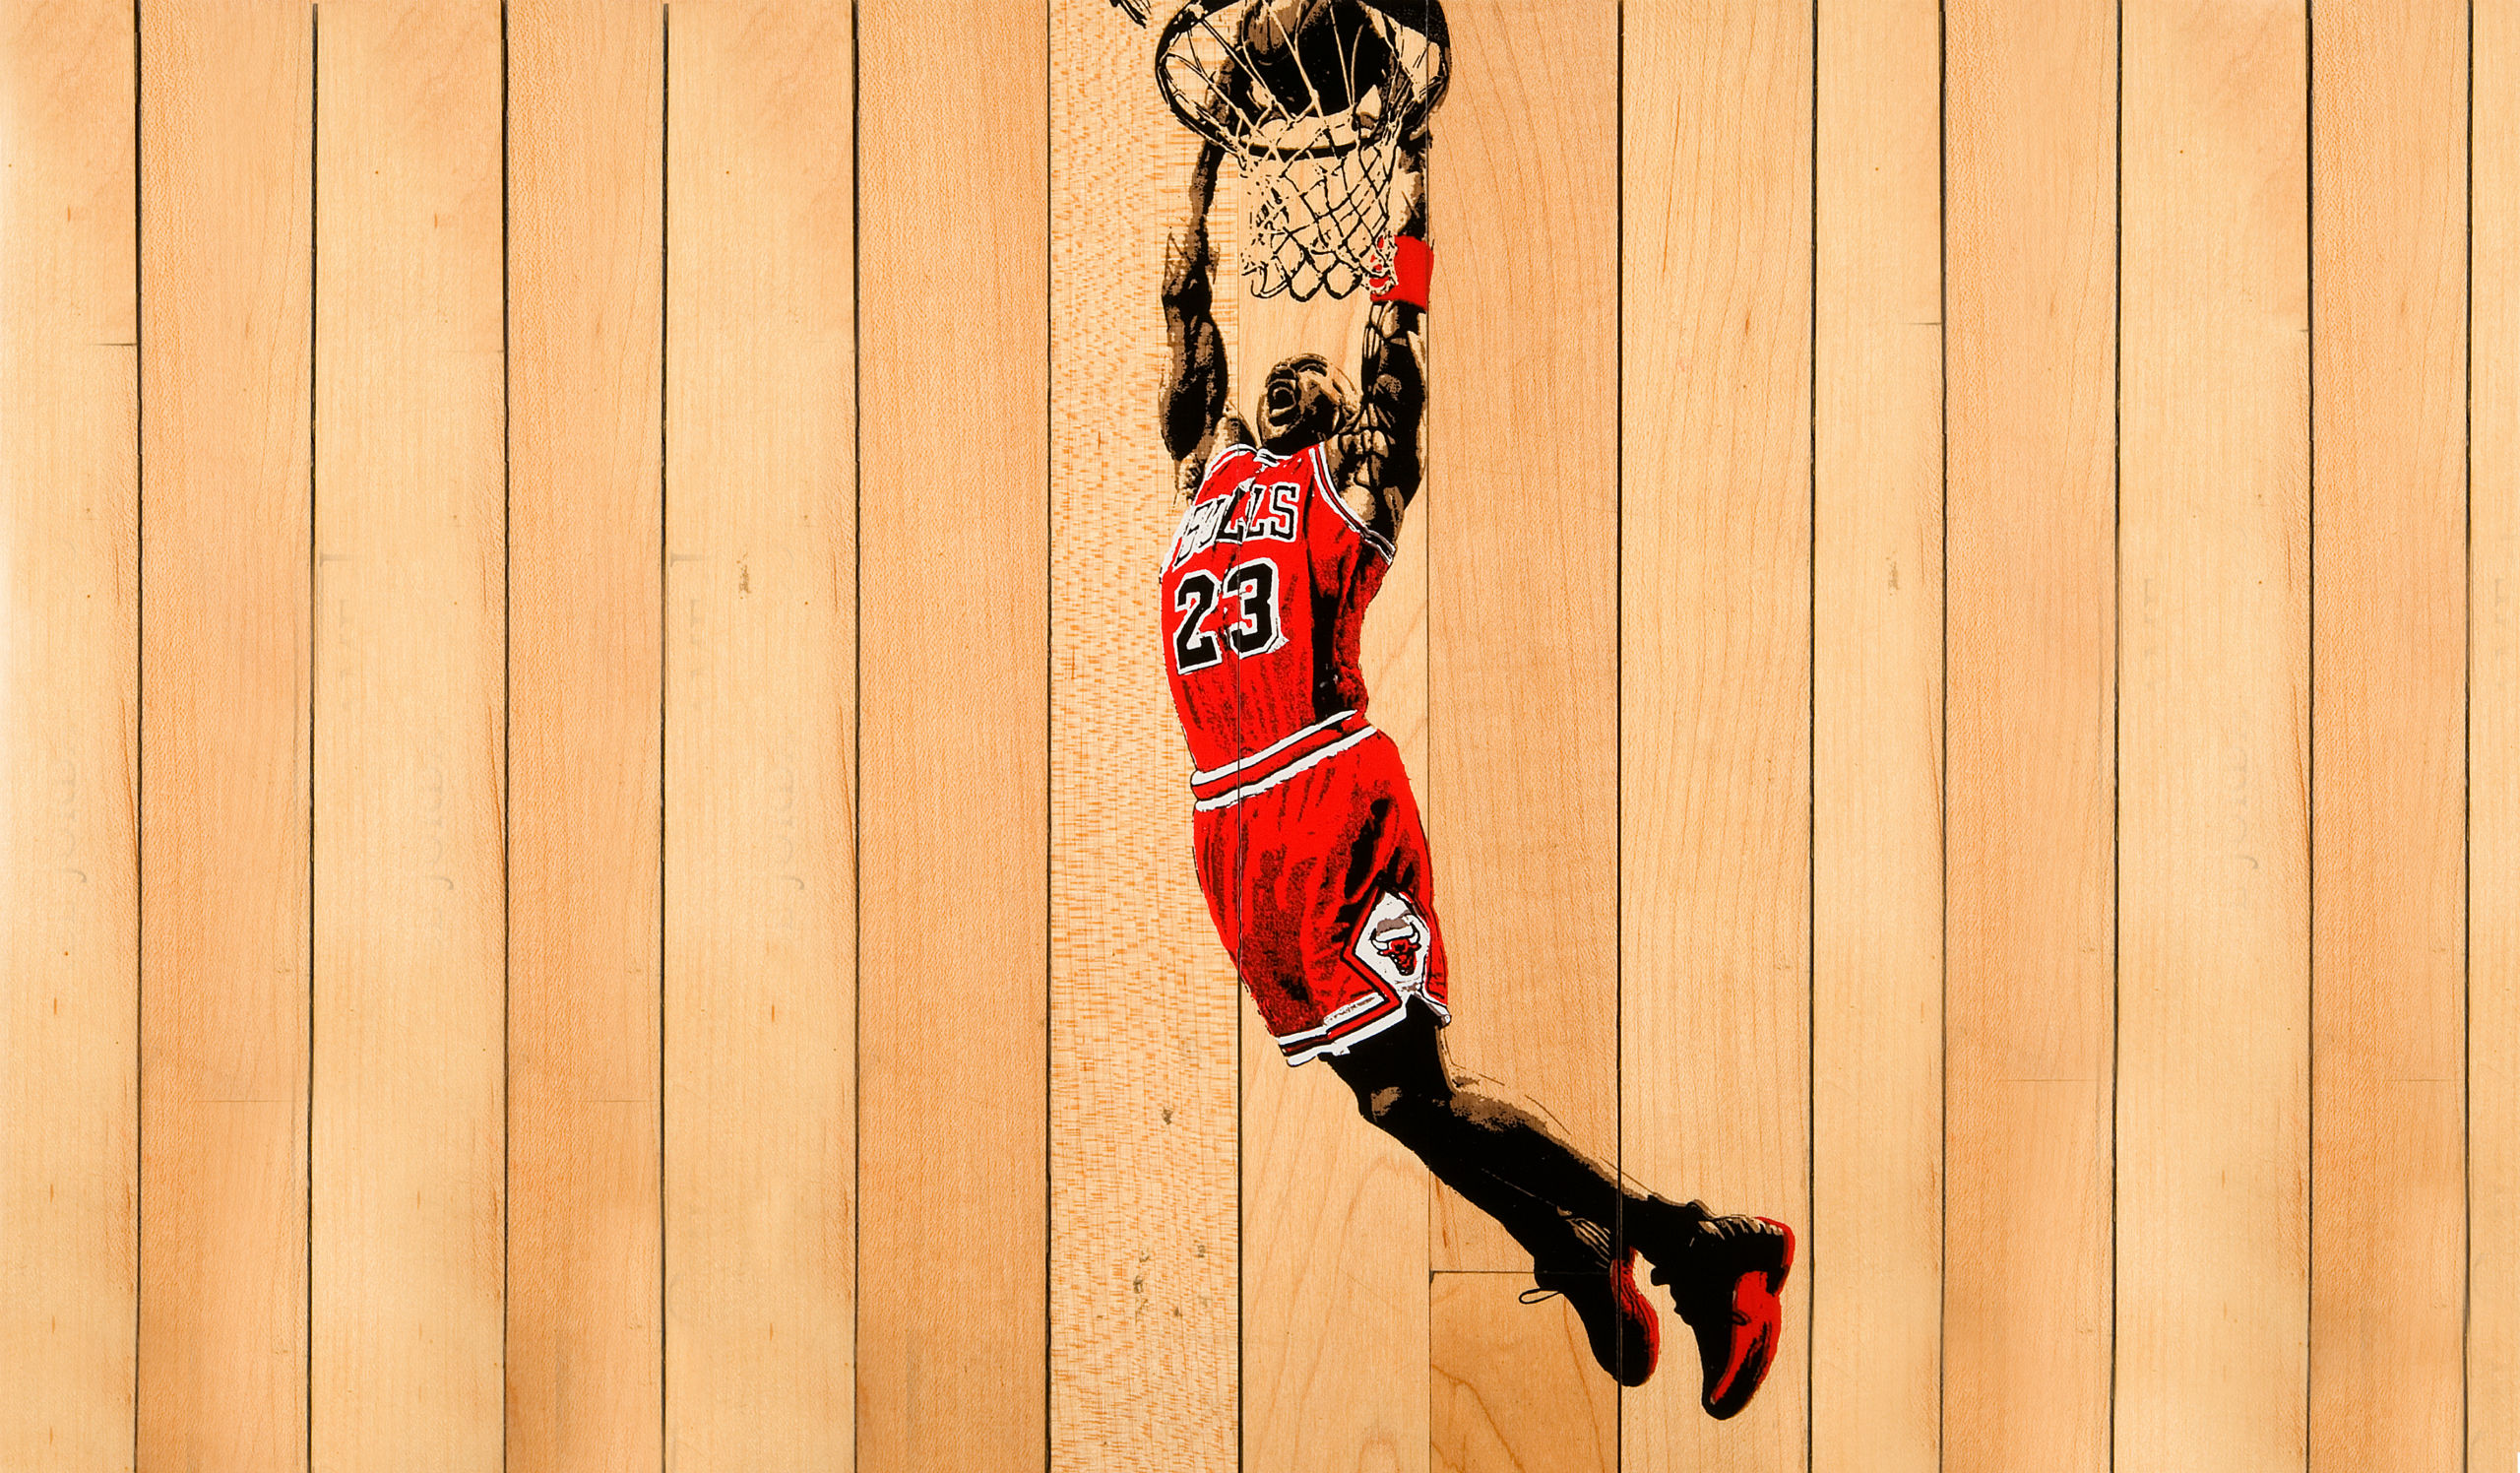 Chicago Sports Wallpaper Iphone 6s: Michael Jordan IPhone 6 Wallpaper